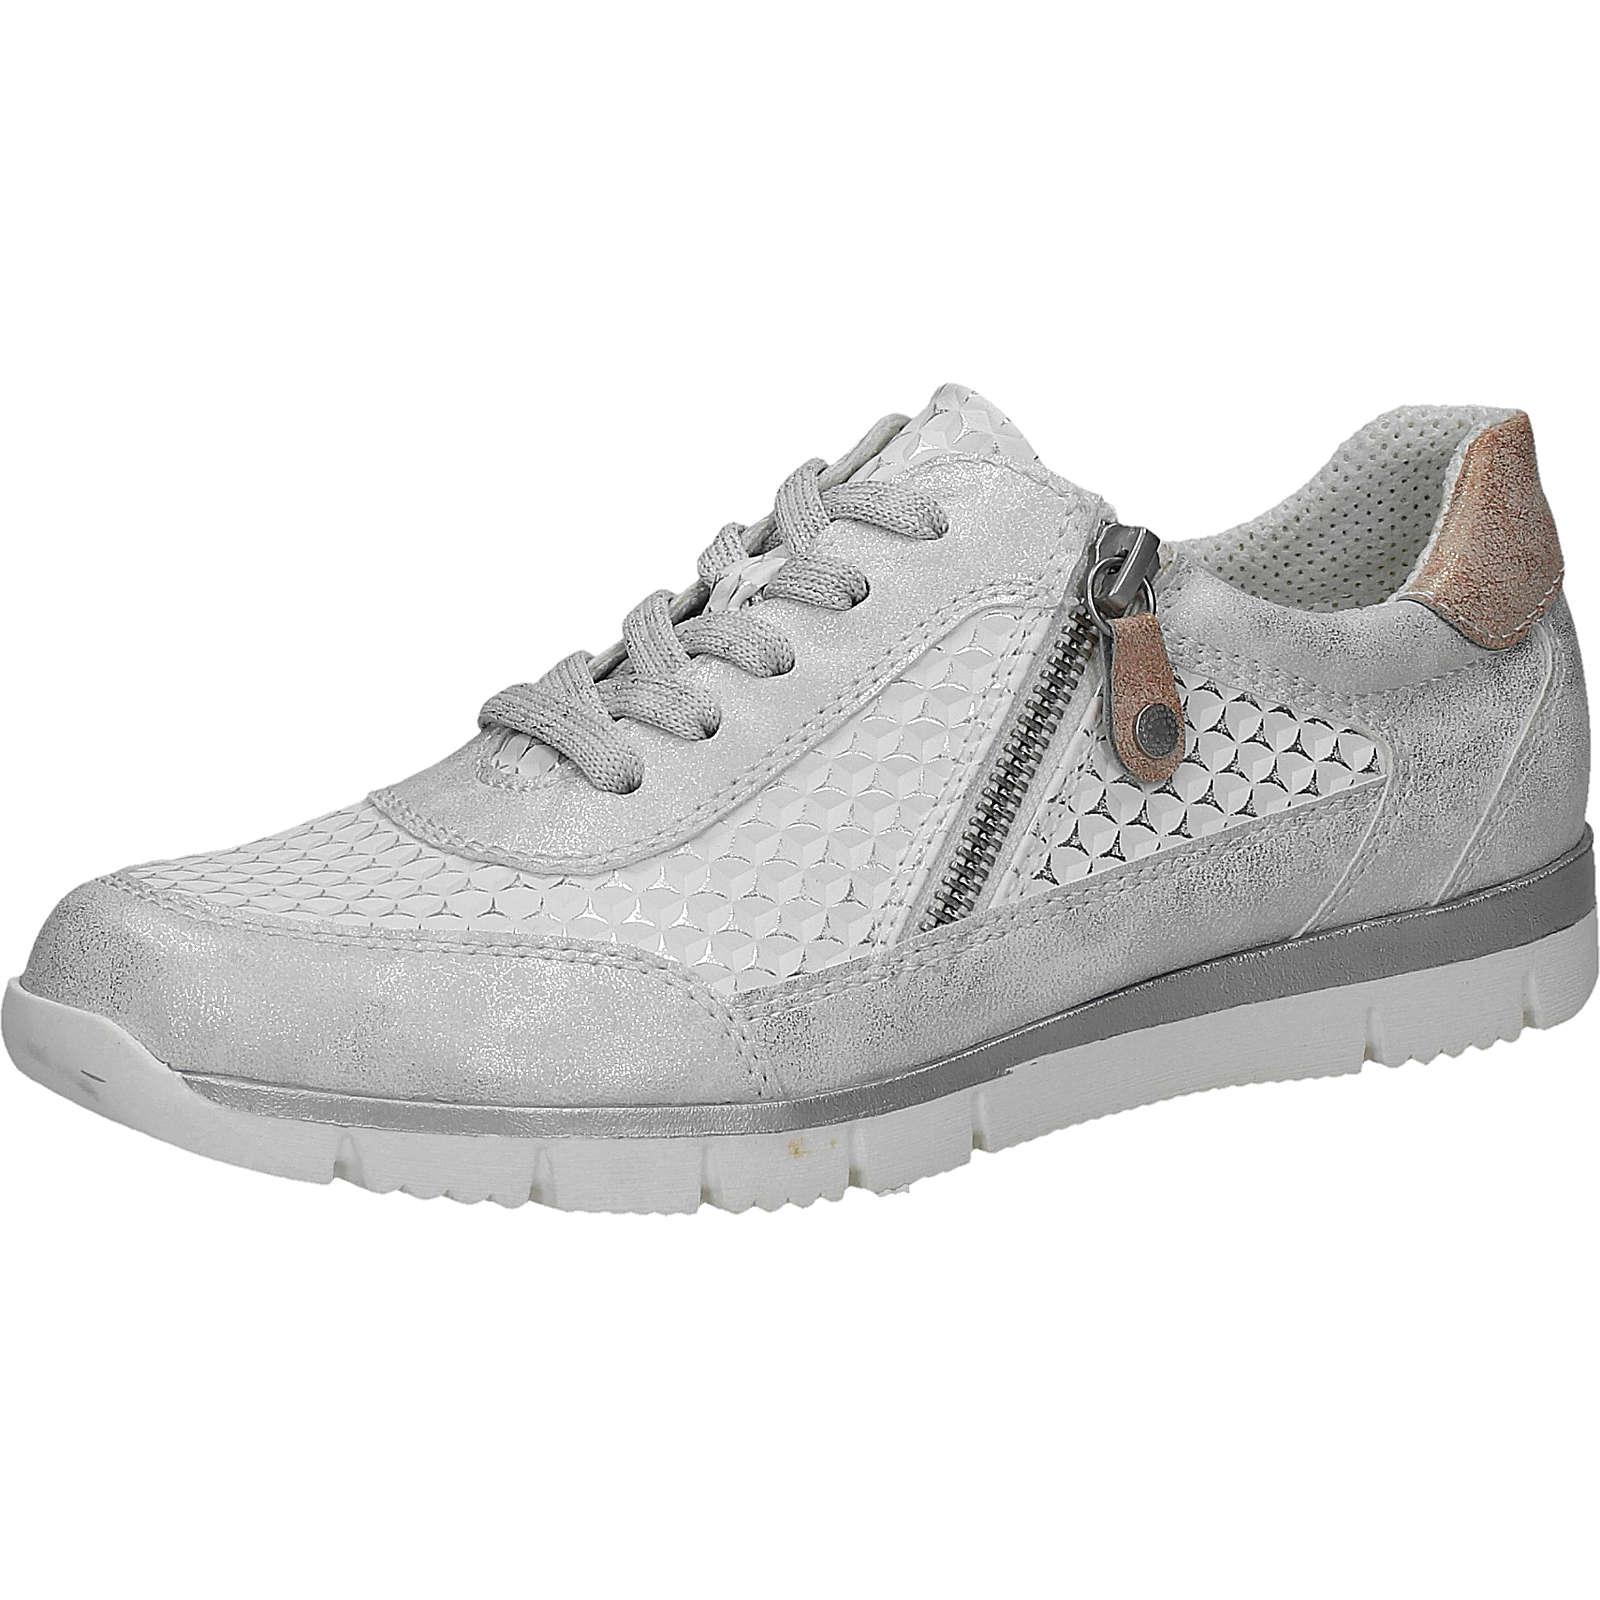 meet cf8c6 2014f Rabatt-Preisvergleich.de - bama Sneaker Sneakers Low weiß ...